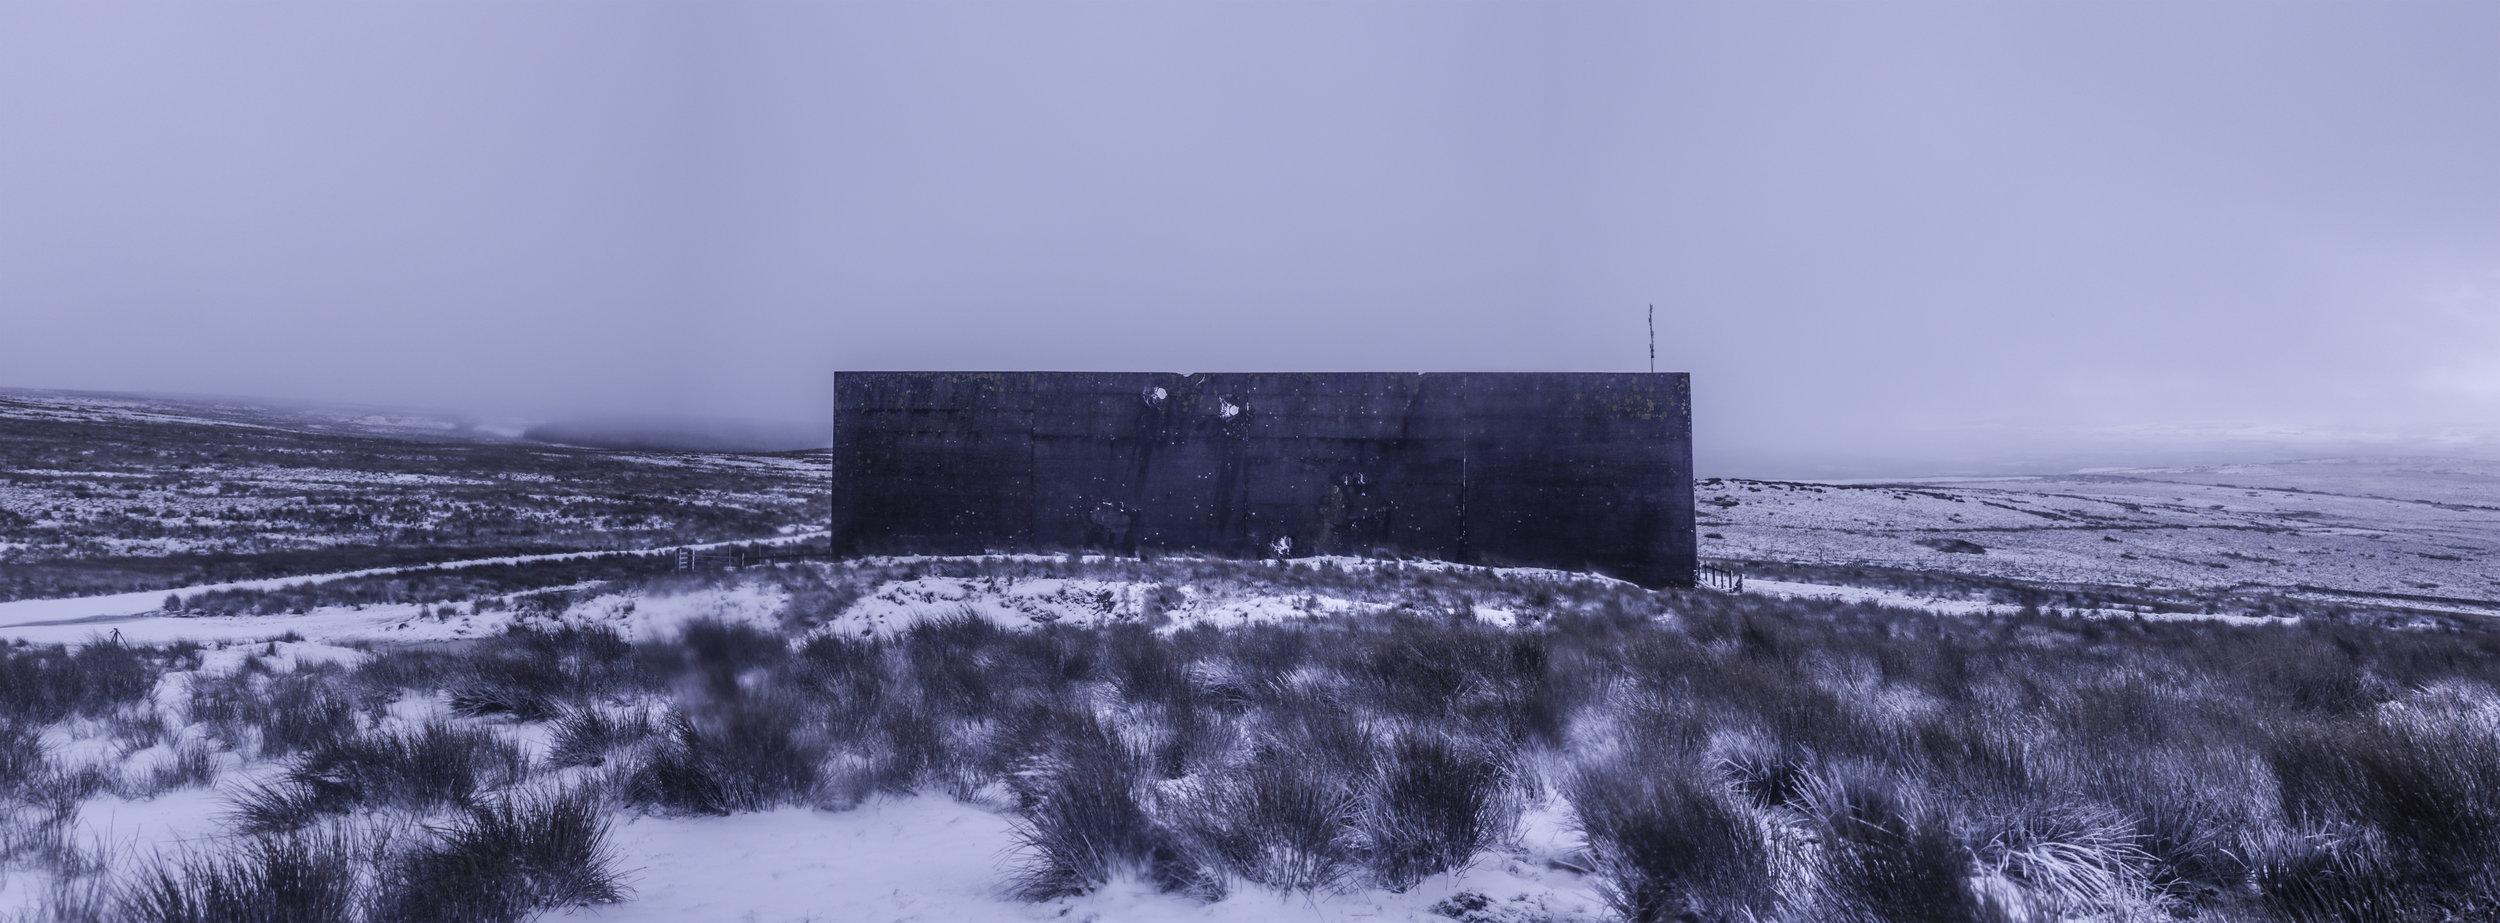 RAF Bomber Command target wall, secret location, Scotland 11 February, 2018. (Photo/Mark Pearson)